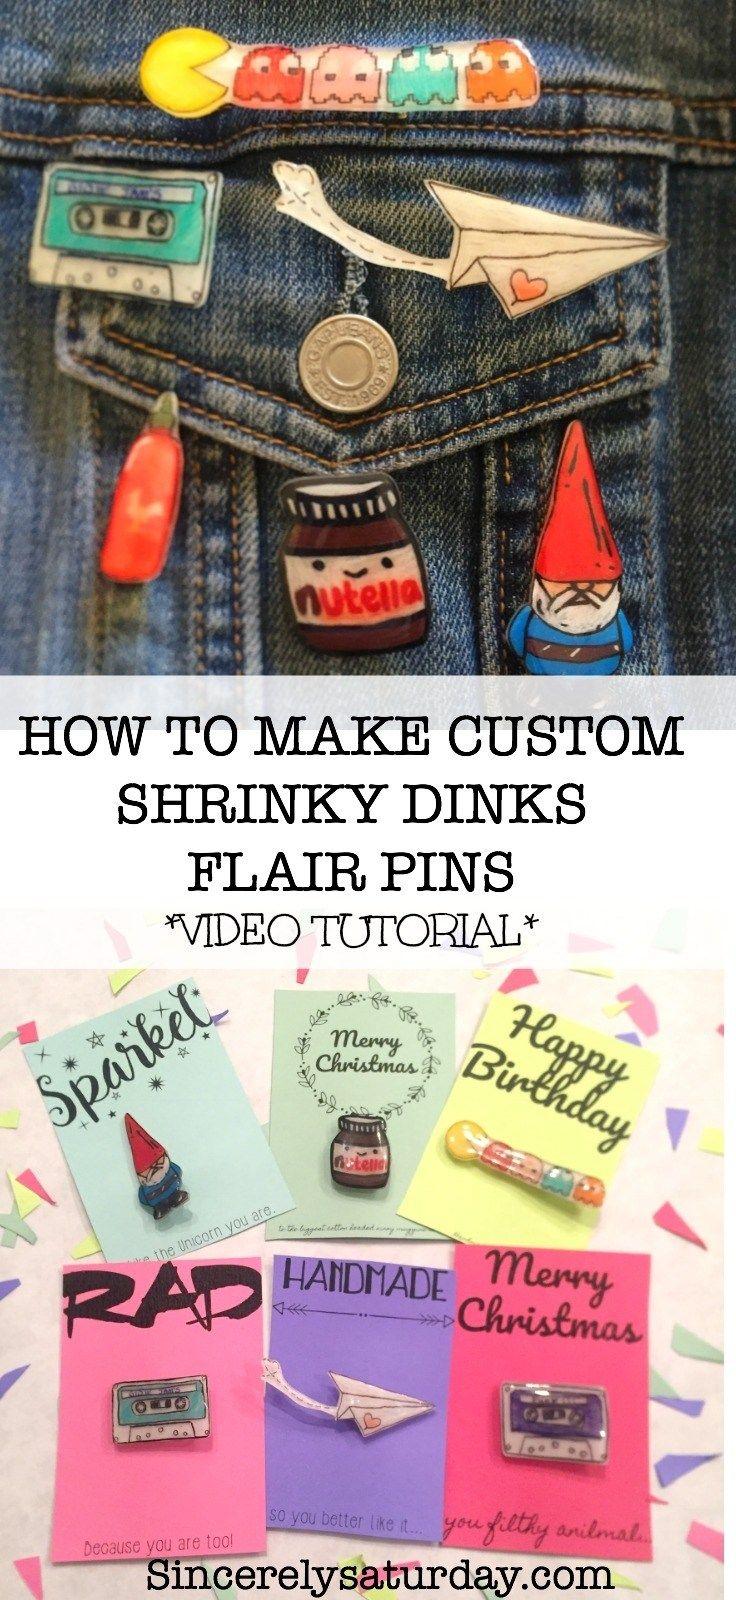 MAKE CUSTOM FLAIR PINS USING SHRINKY DINKS - VIDEO TUTORIAL | Sincerely Saturday